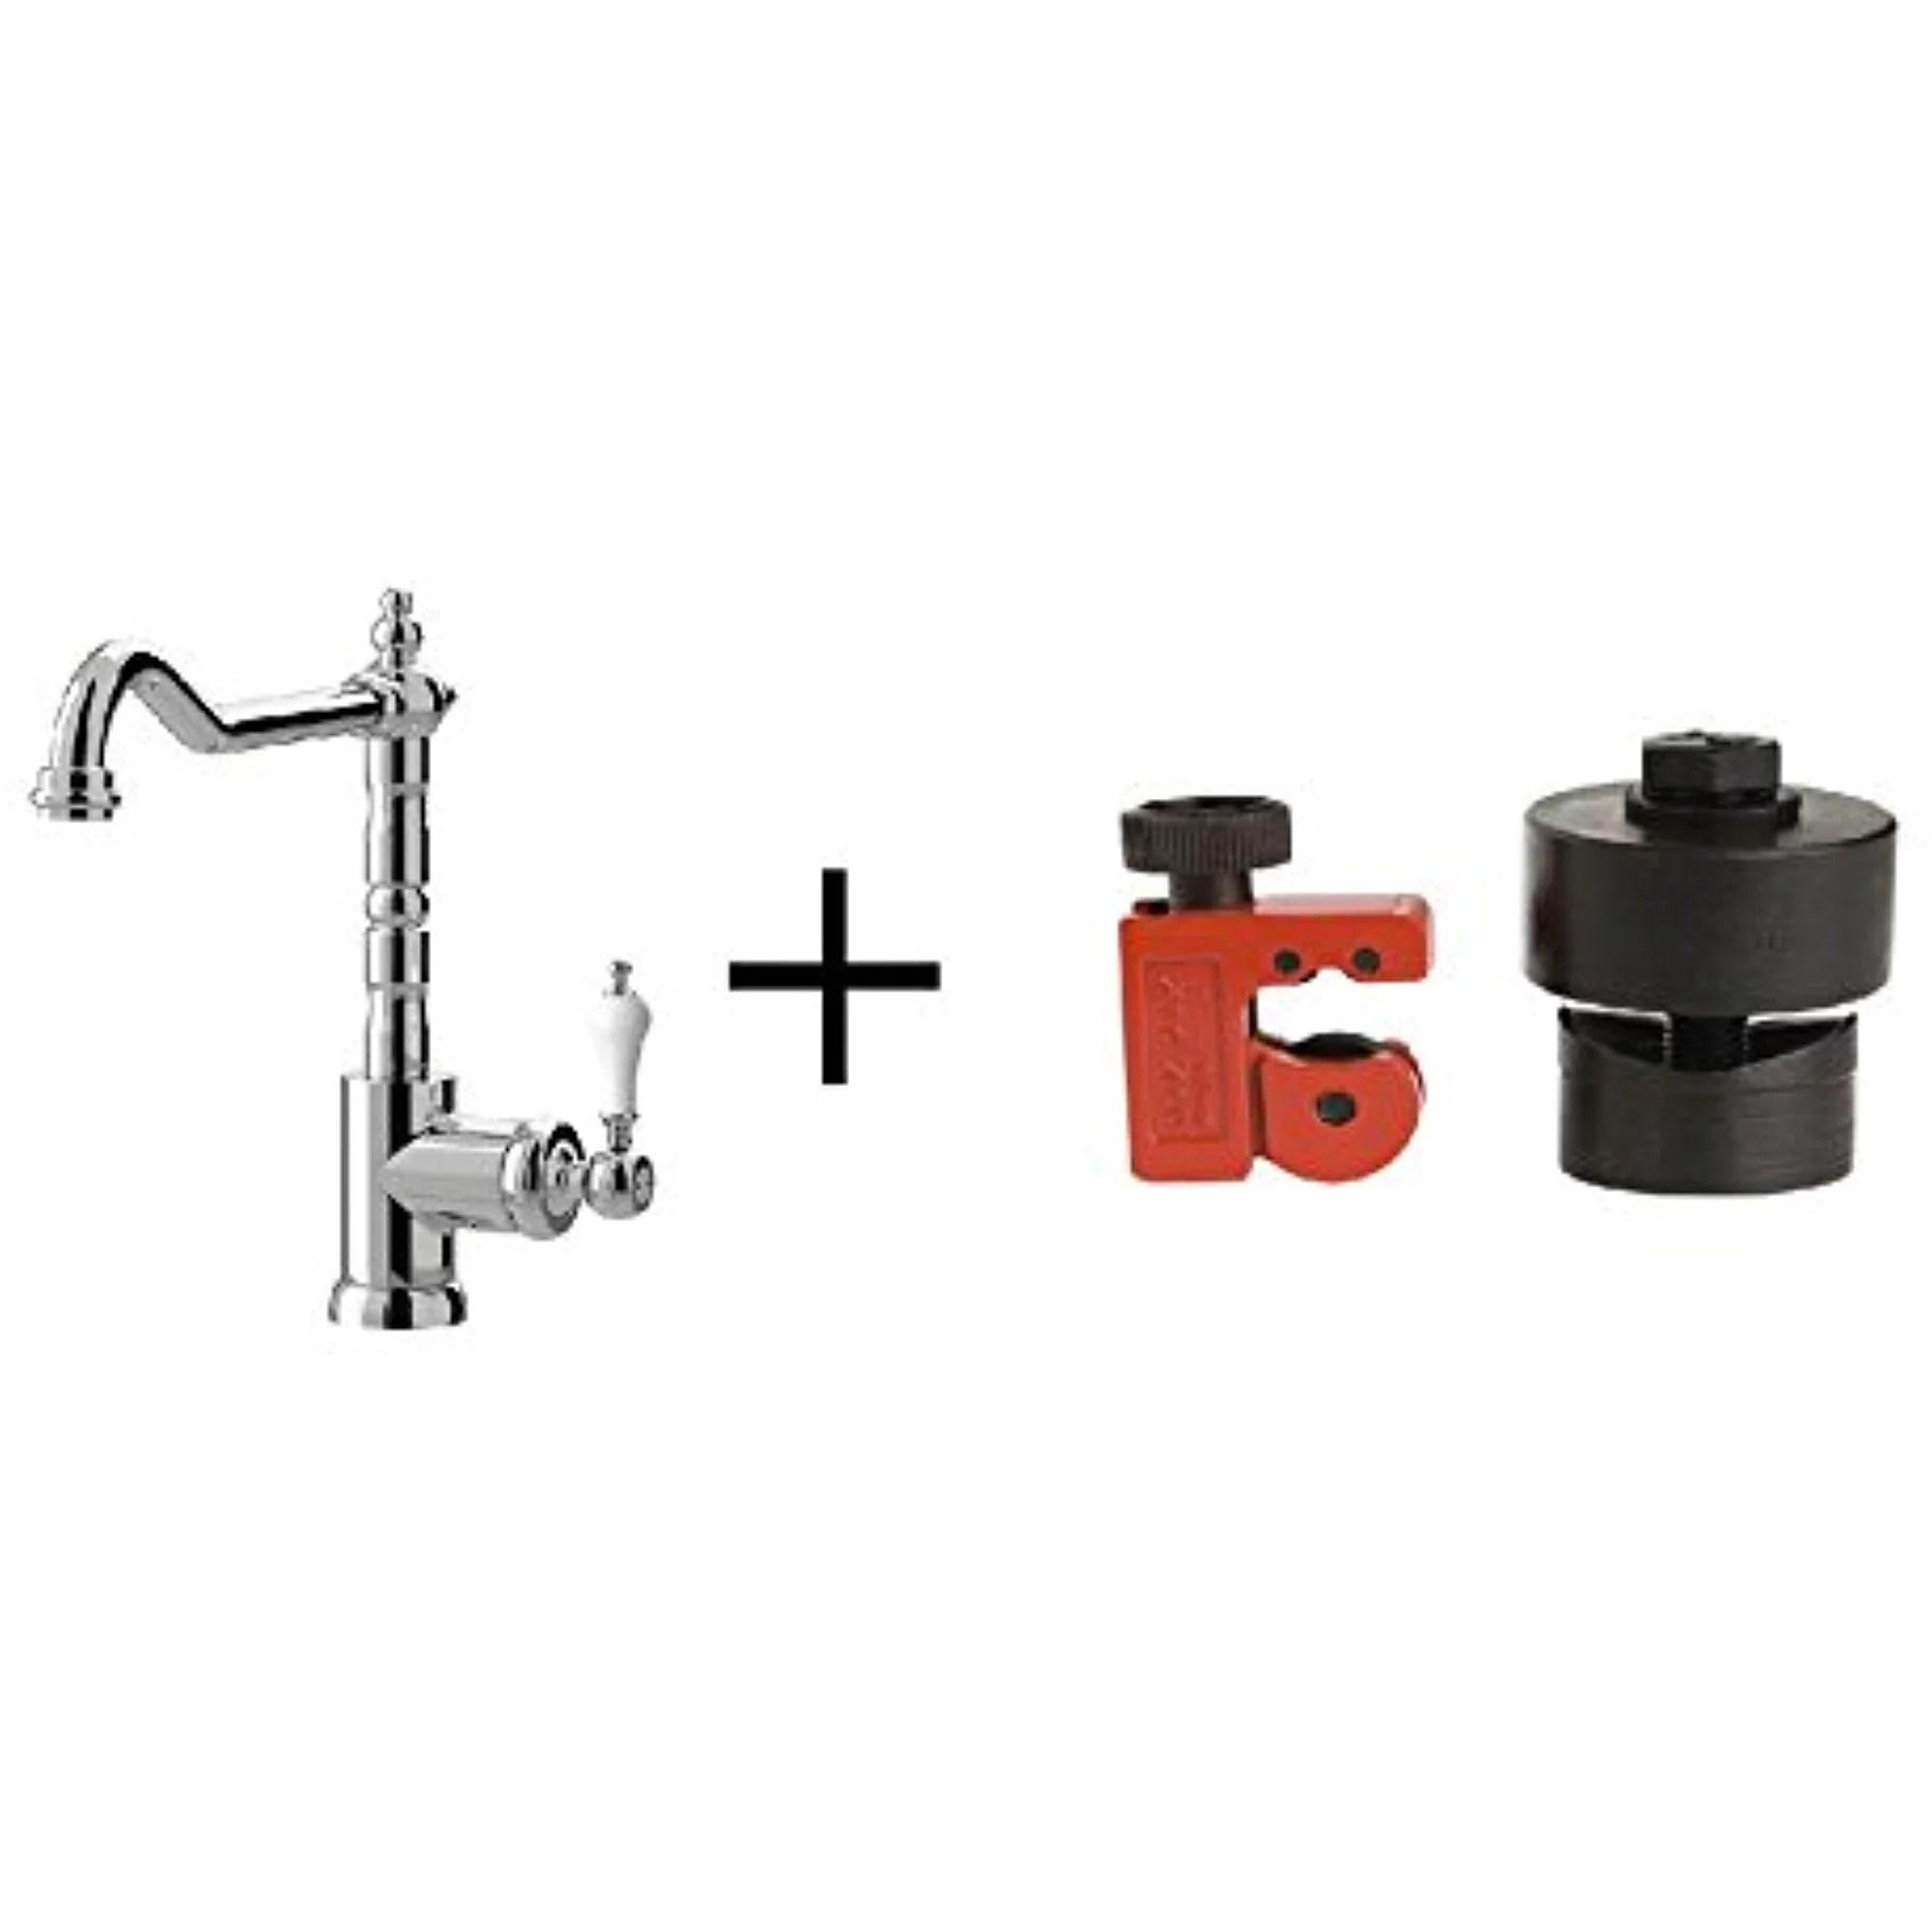 ikea kitchen faucet chrome plated and ikea 2 piece tool set